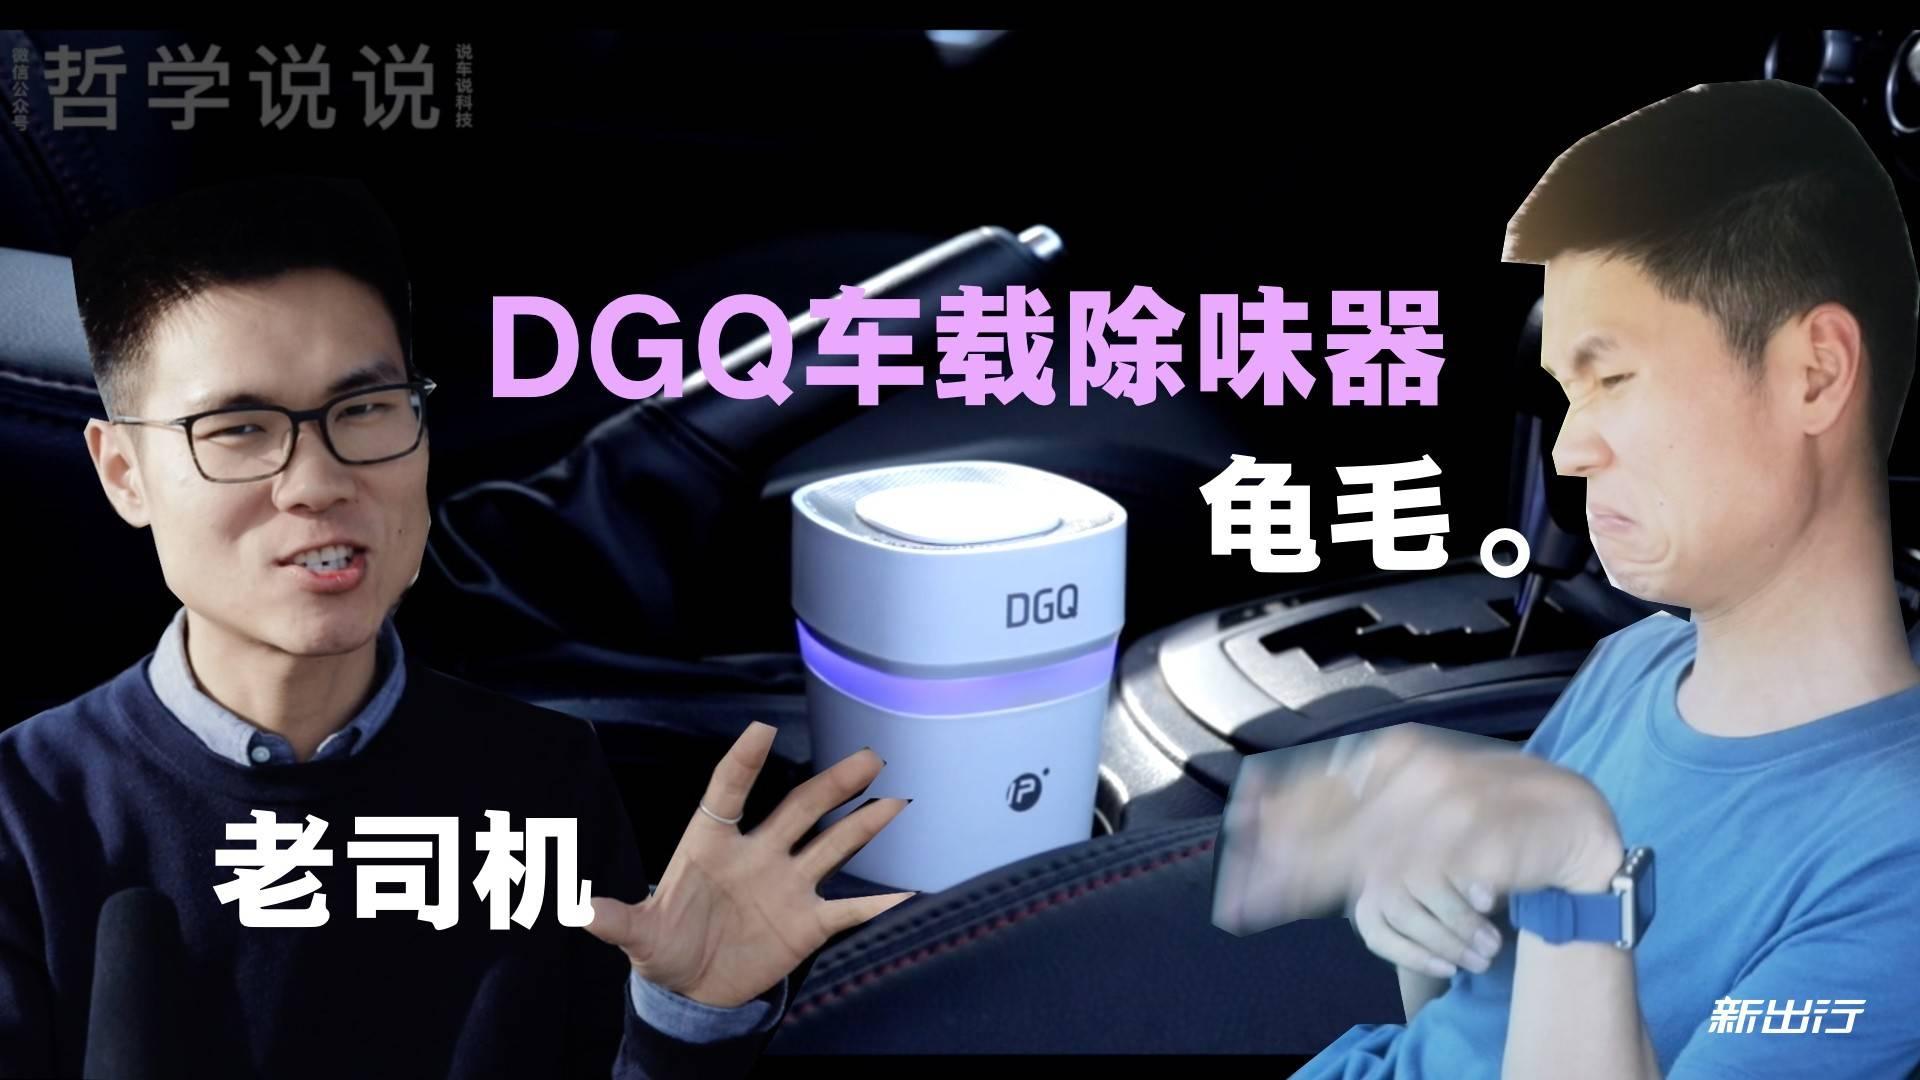 DGQ车载除味器-封面图.jpg